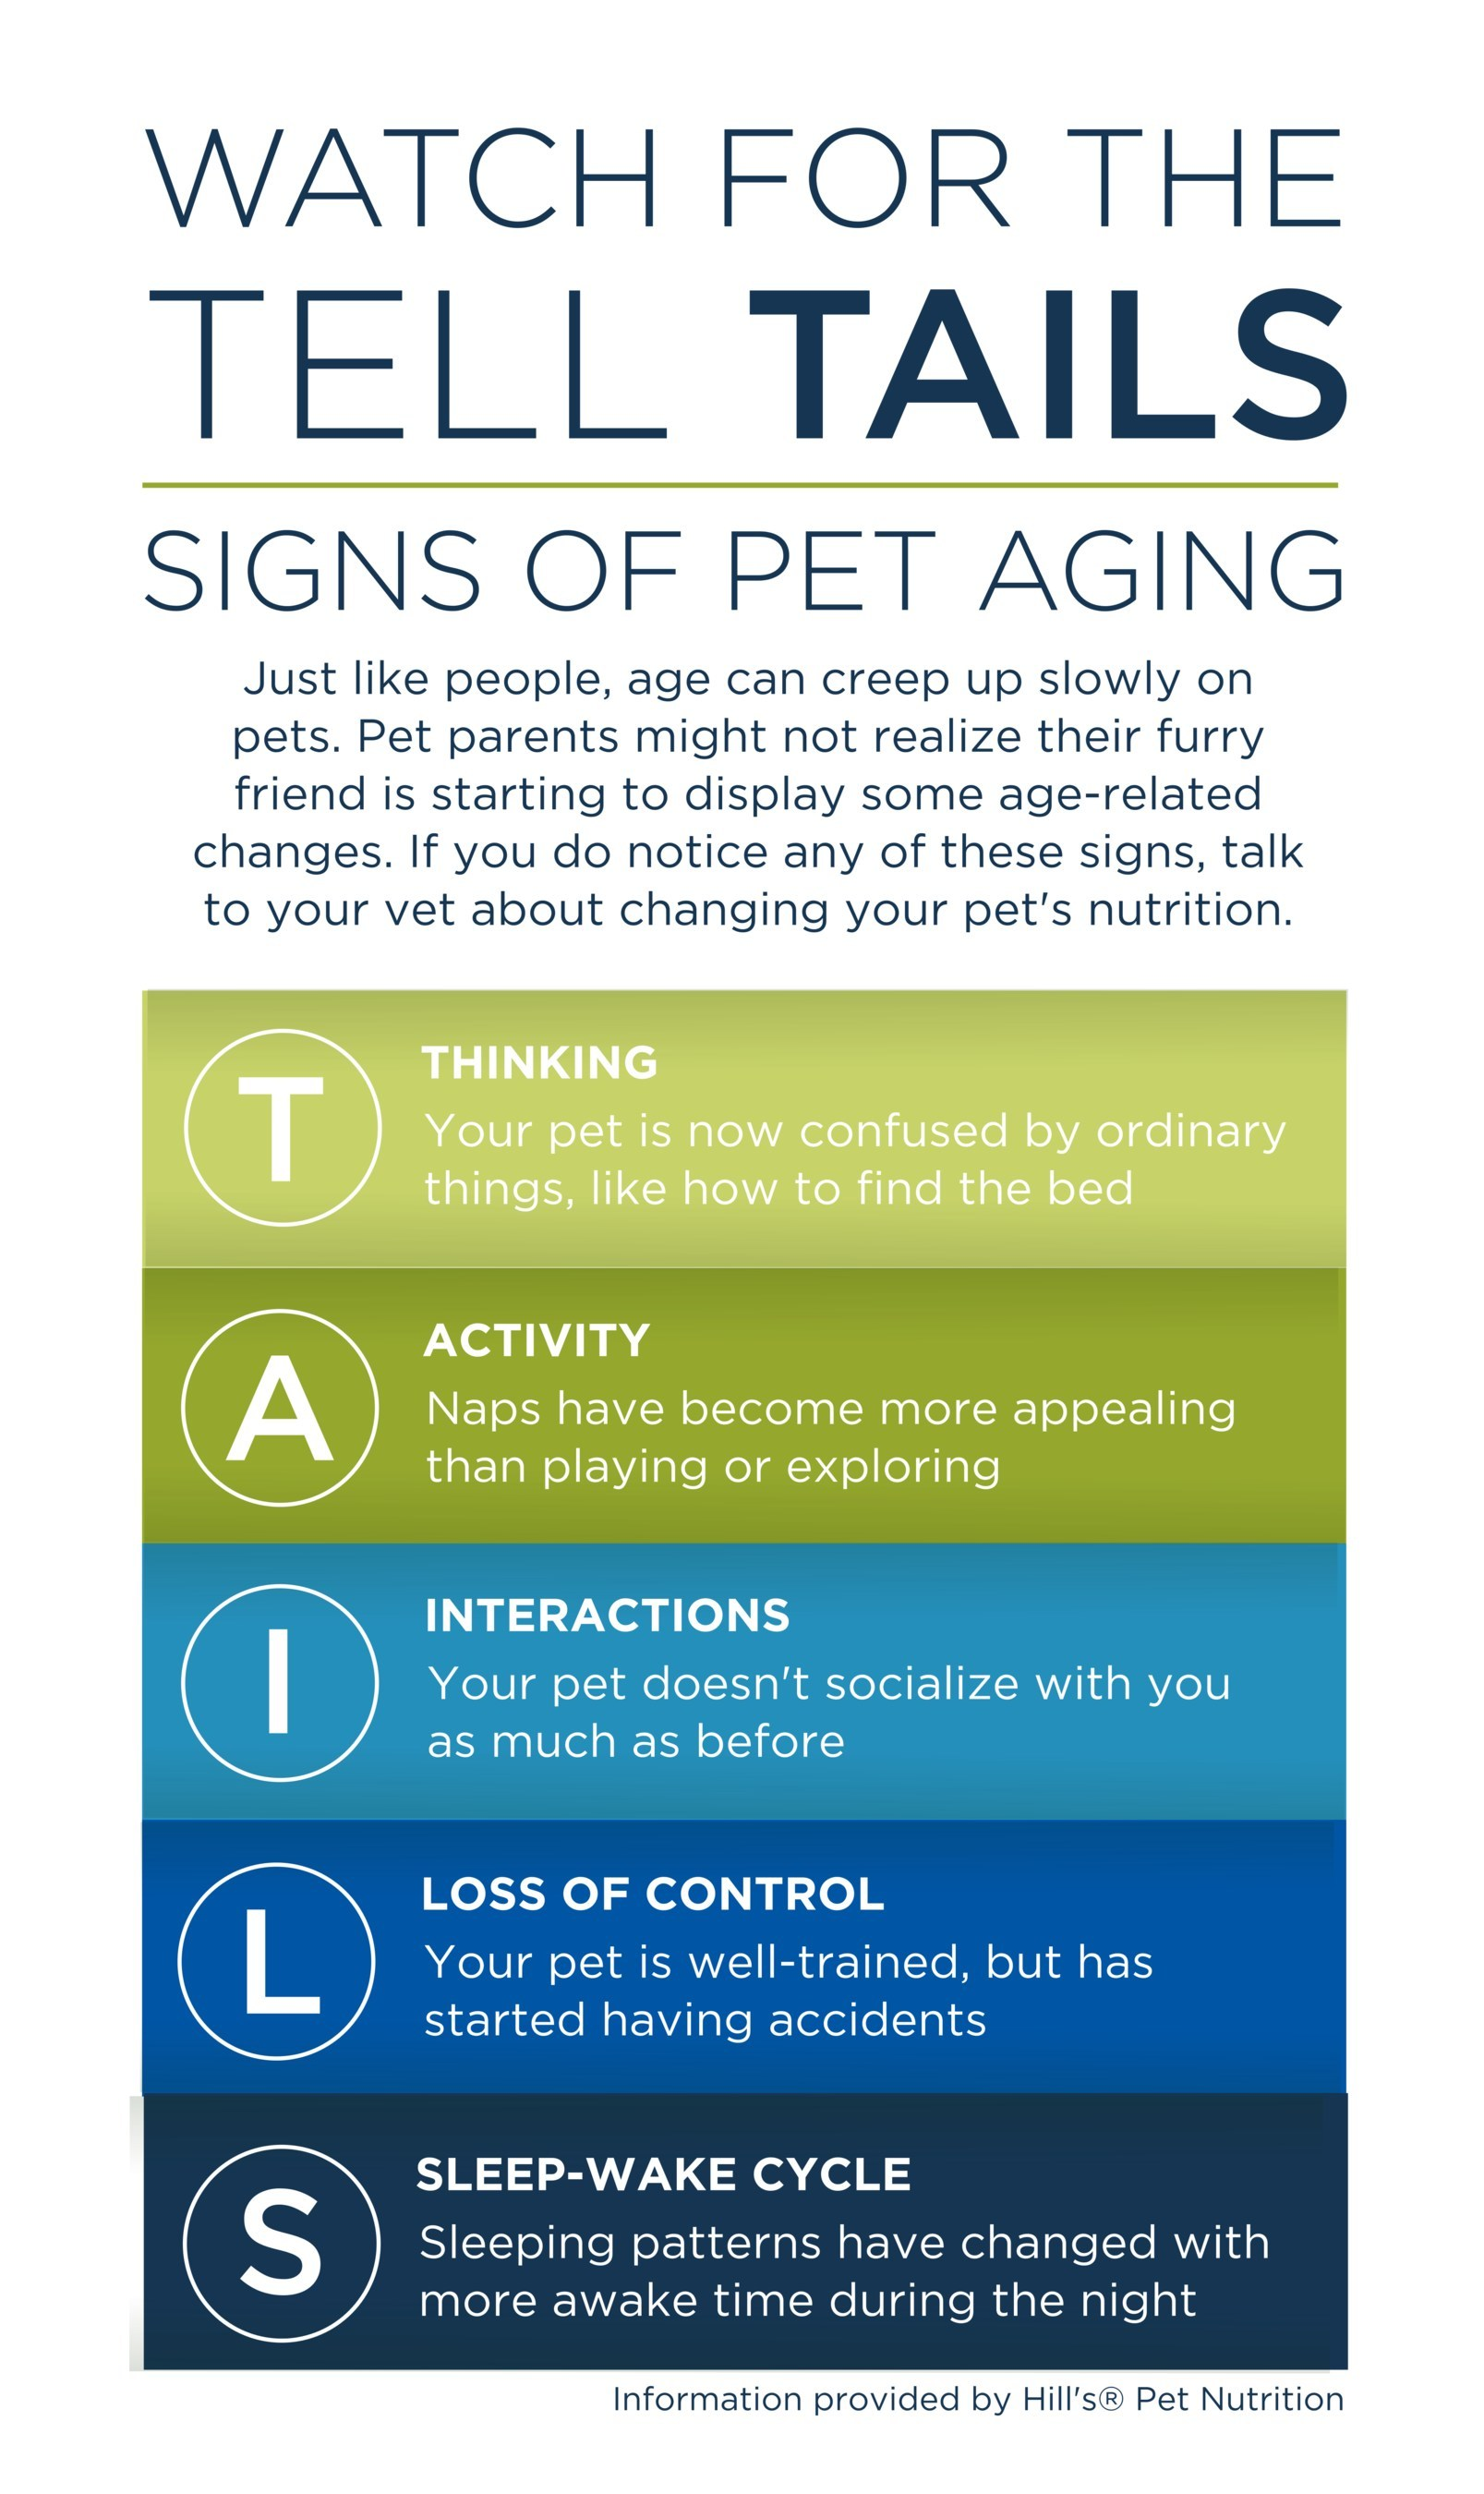 (PRNewsfoto/Hill's Pet Nutrition)